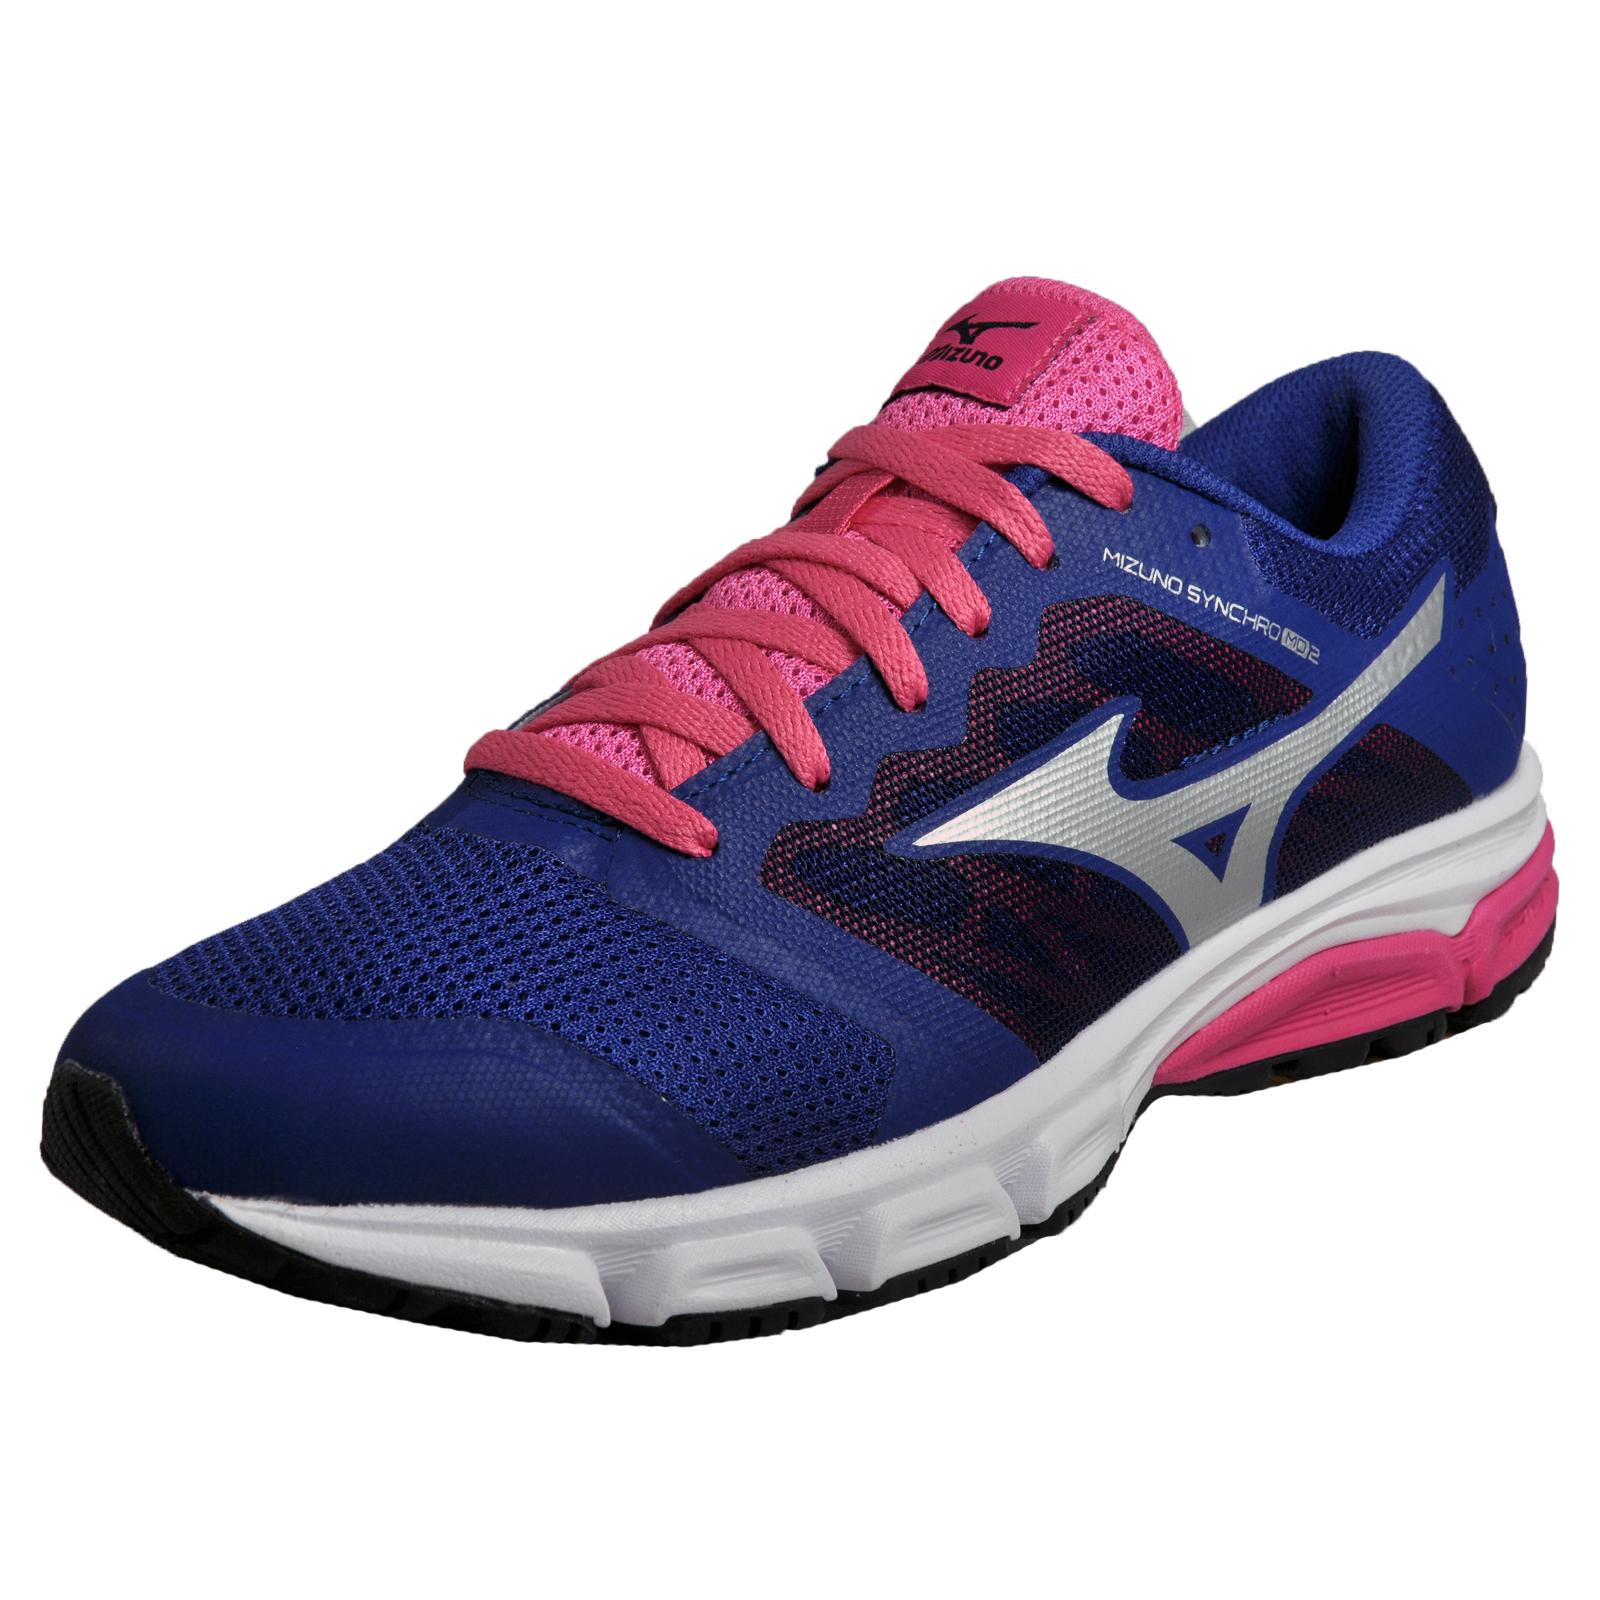 Mizuno Synchro MD 2 Fitness Mujer Running Zapatos Fitness 2 Gym Trainers Azul 6ecaa3